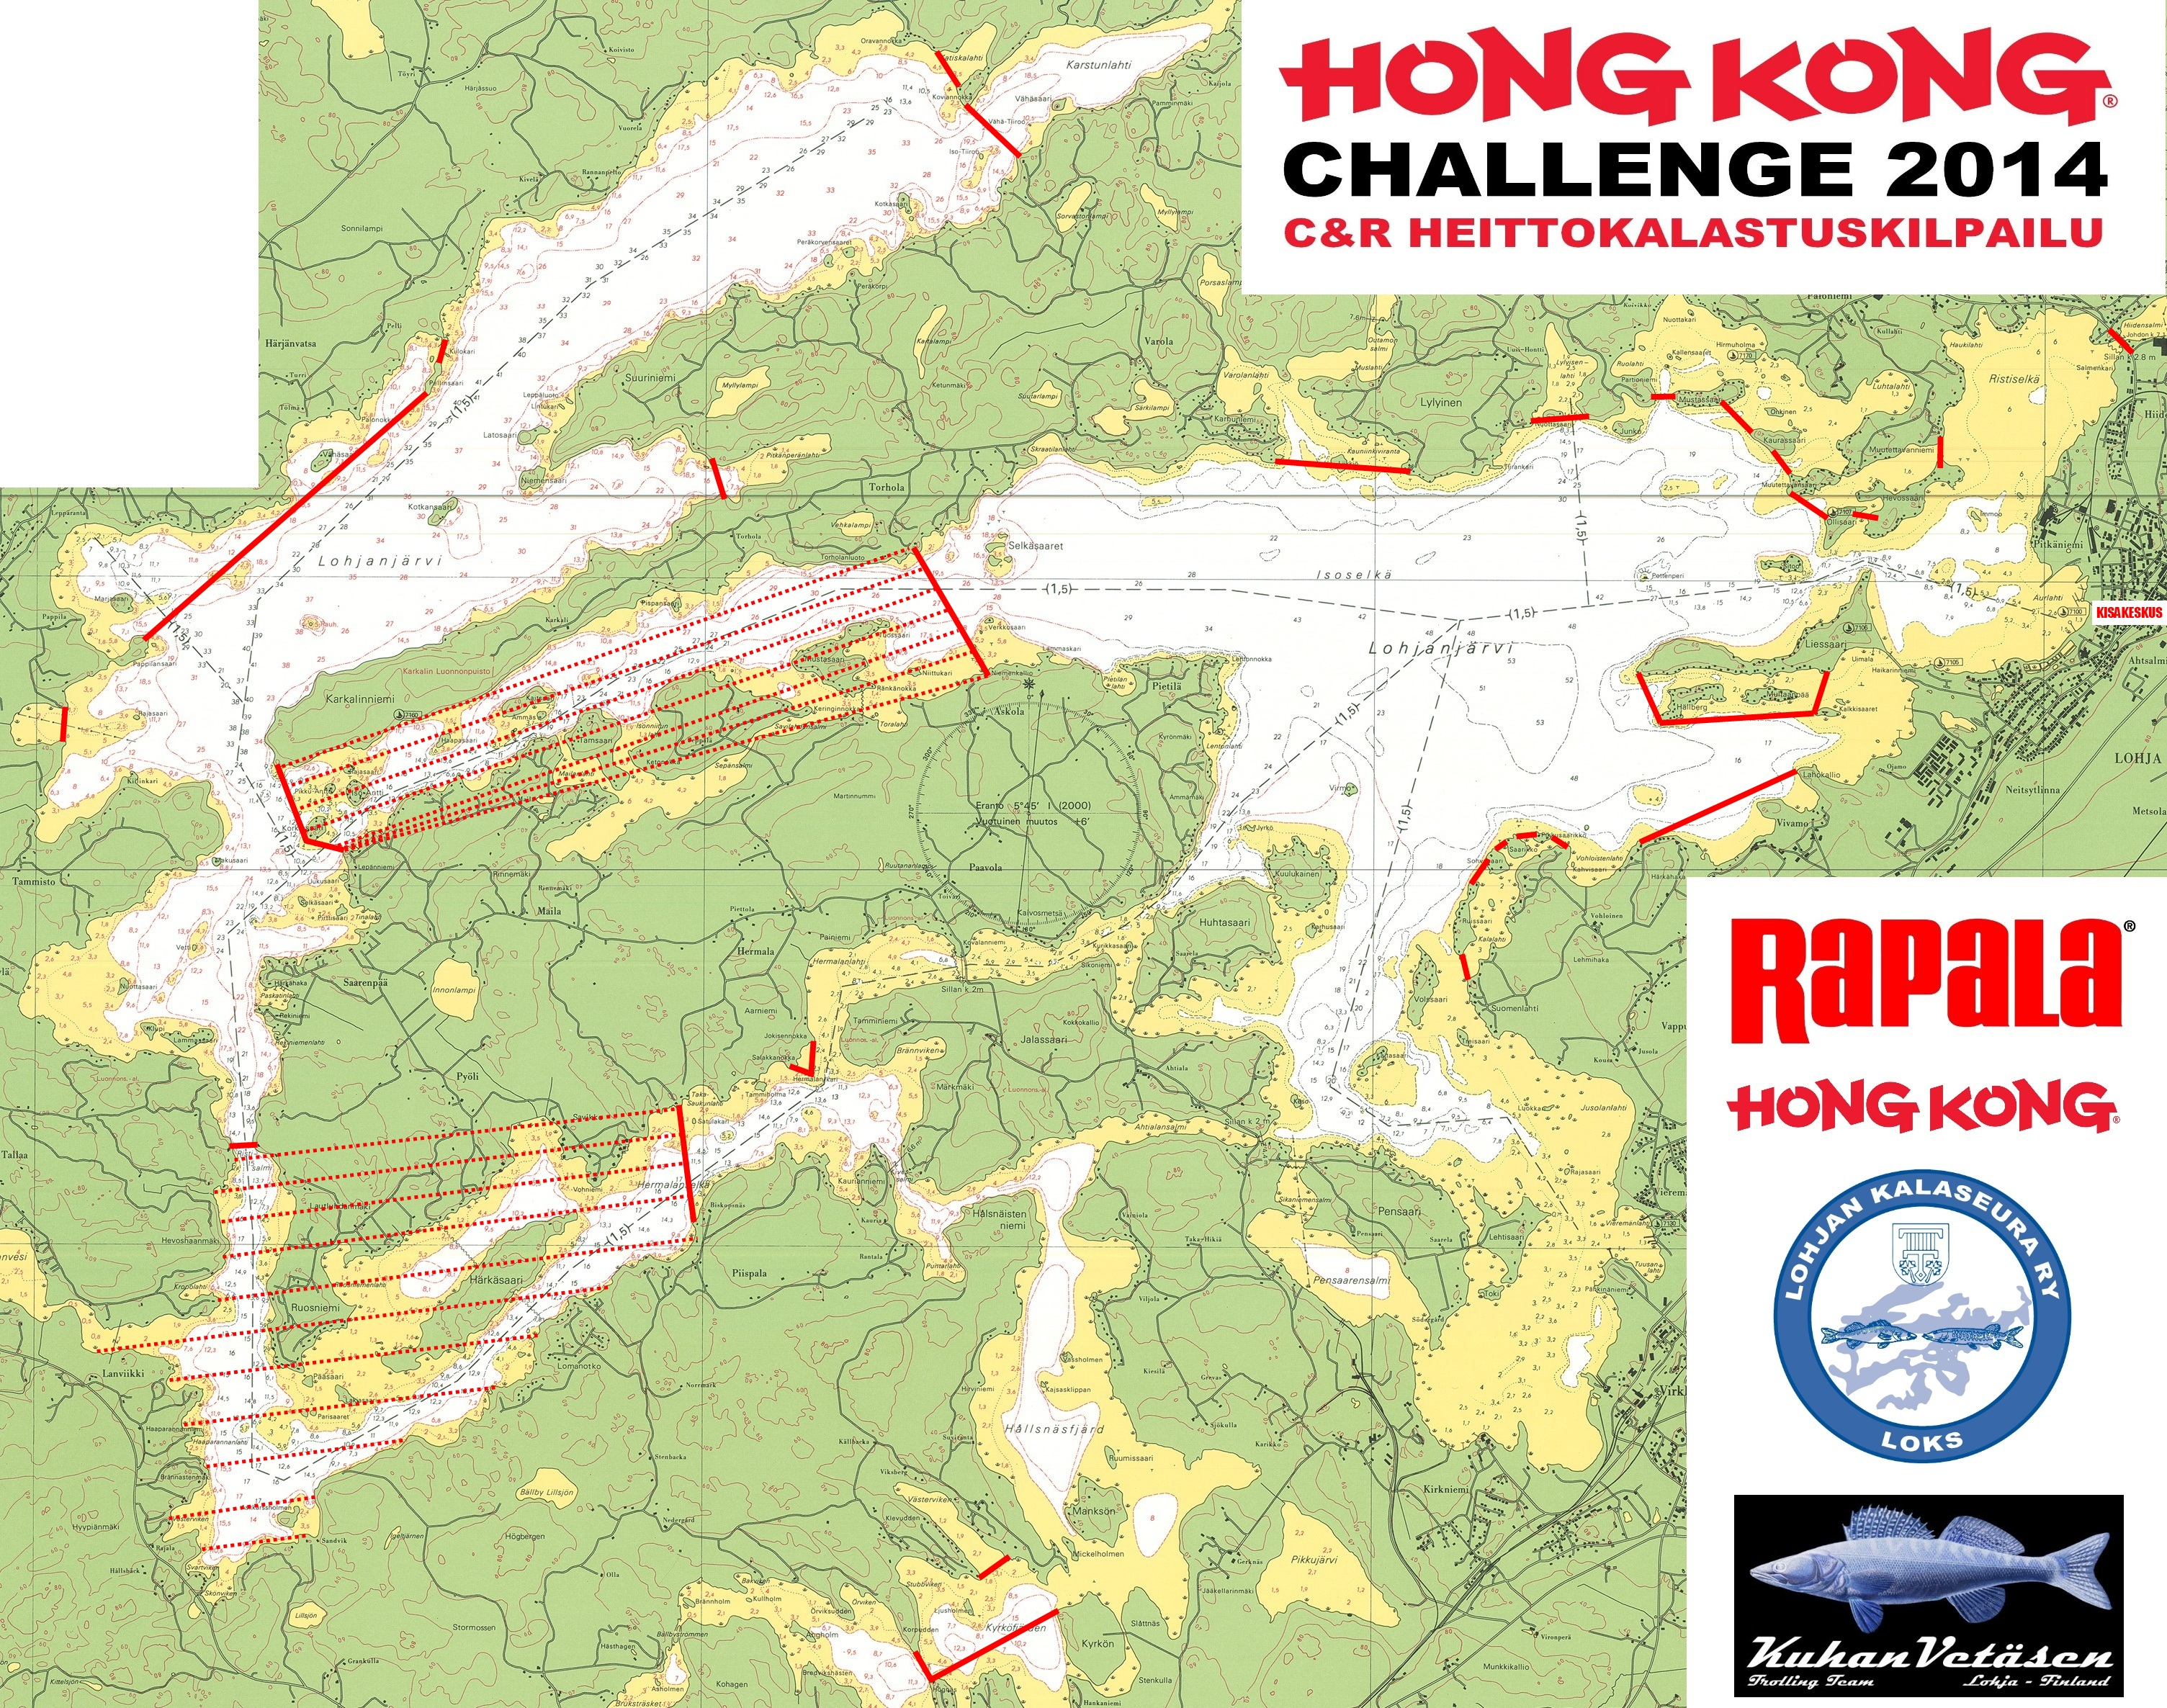 Hong Kong Challenge C R Heittokalastuskilpailu 13 9 2014